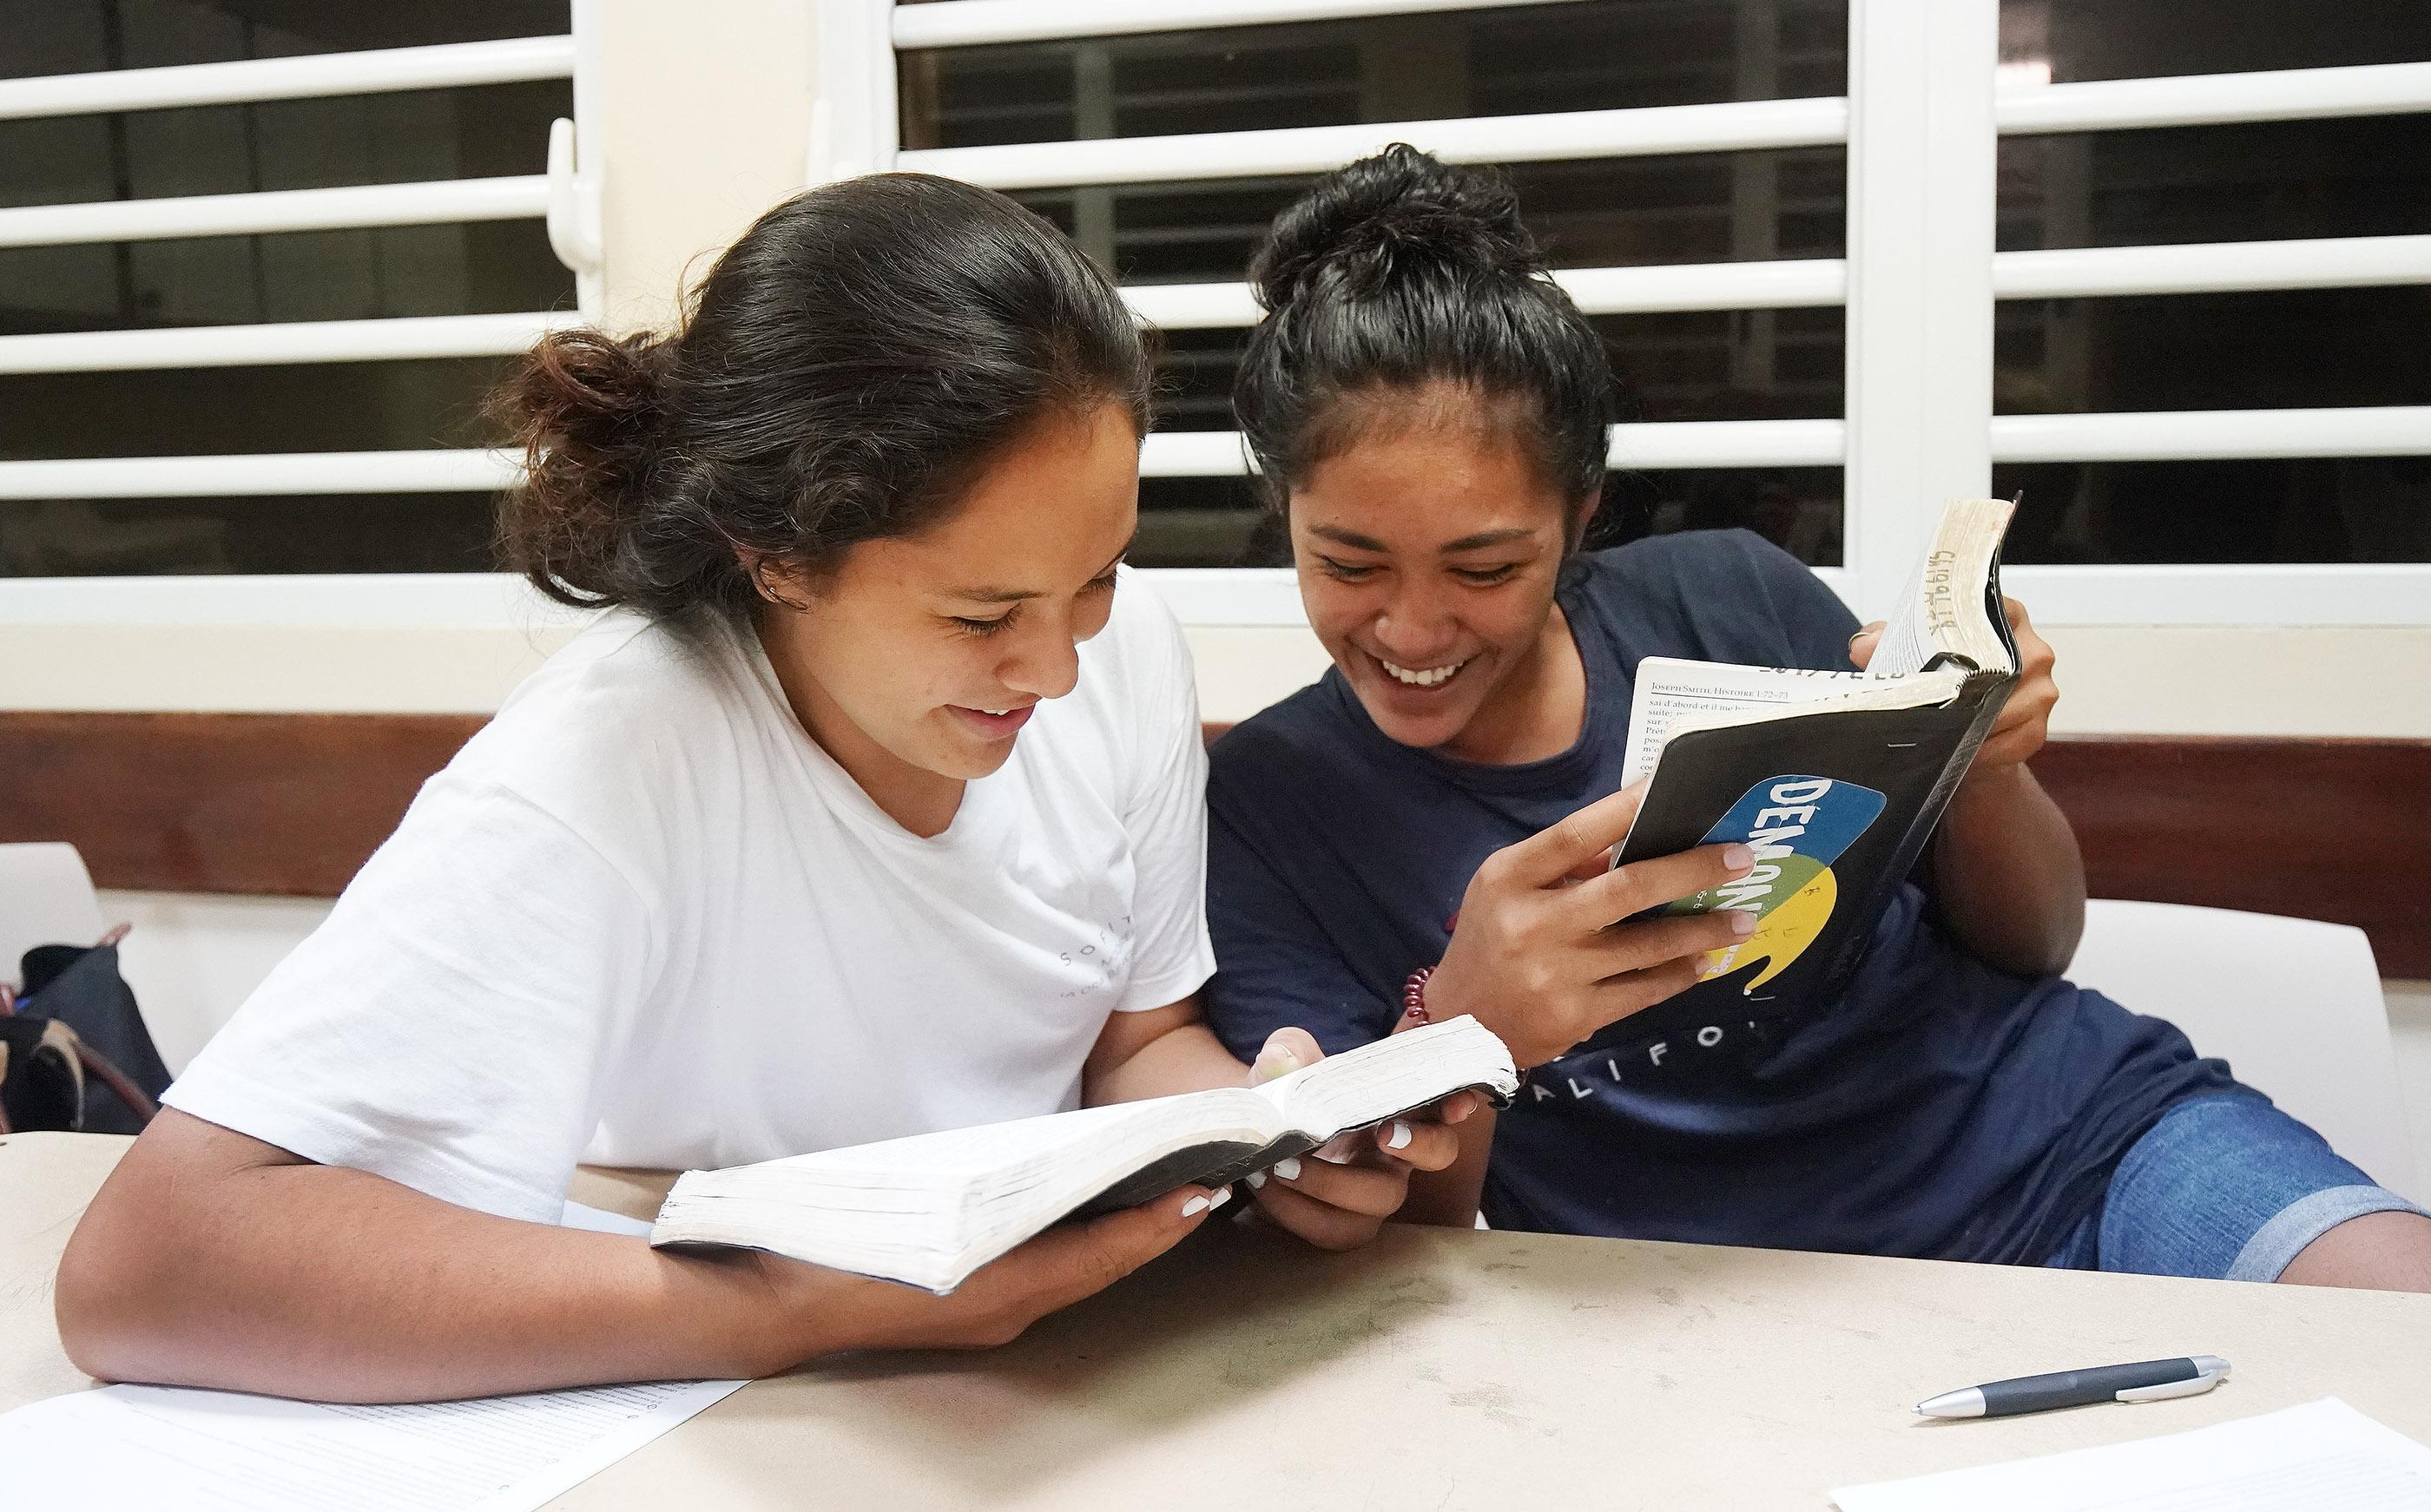 Desiree Tetuanui and Hauhere Nauta read scriptures during Latter-day Saint seminary in Bora Bora on May 28, 2019.